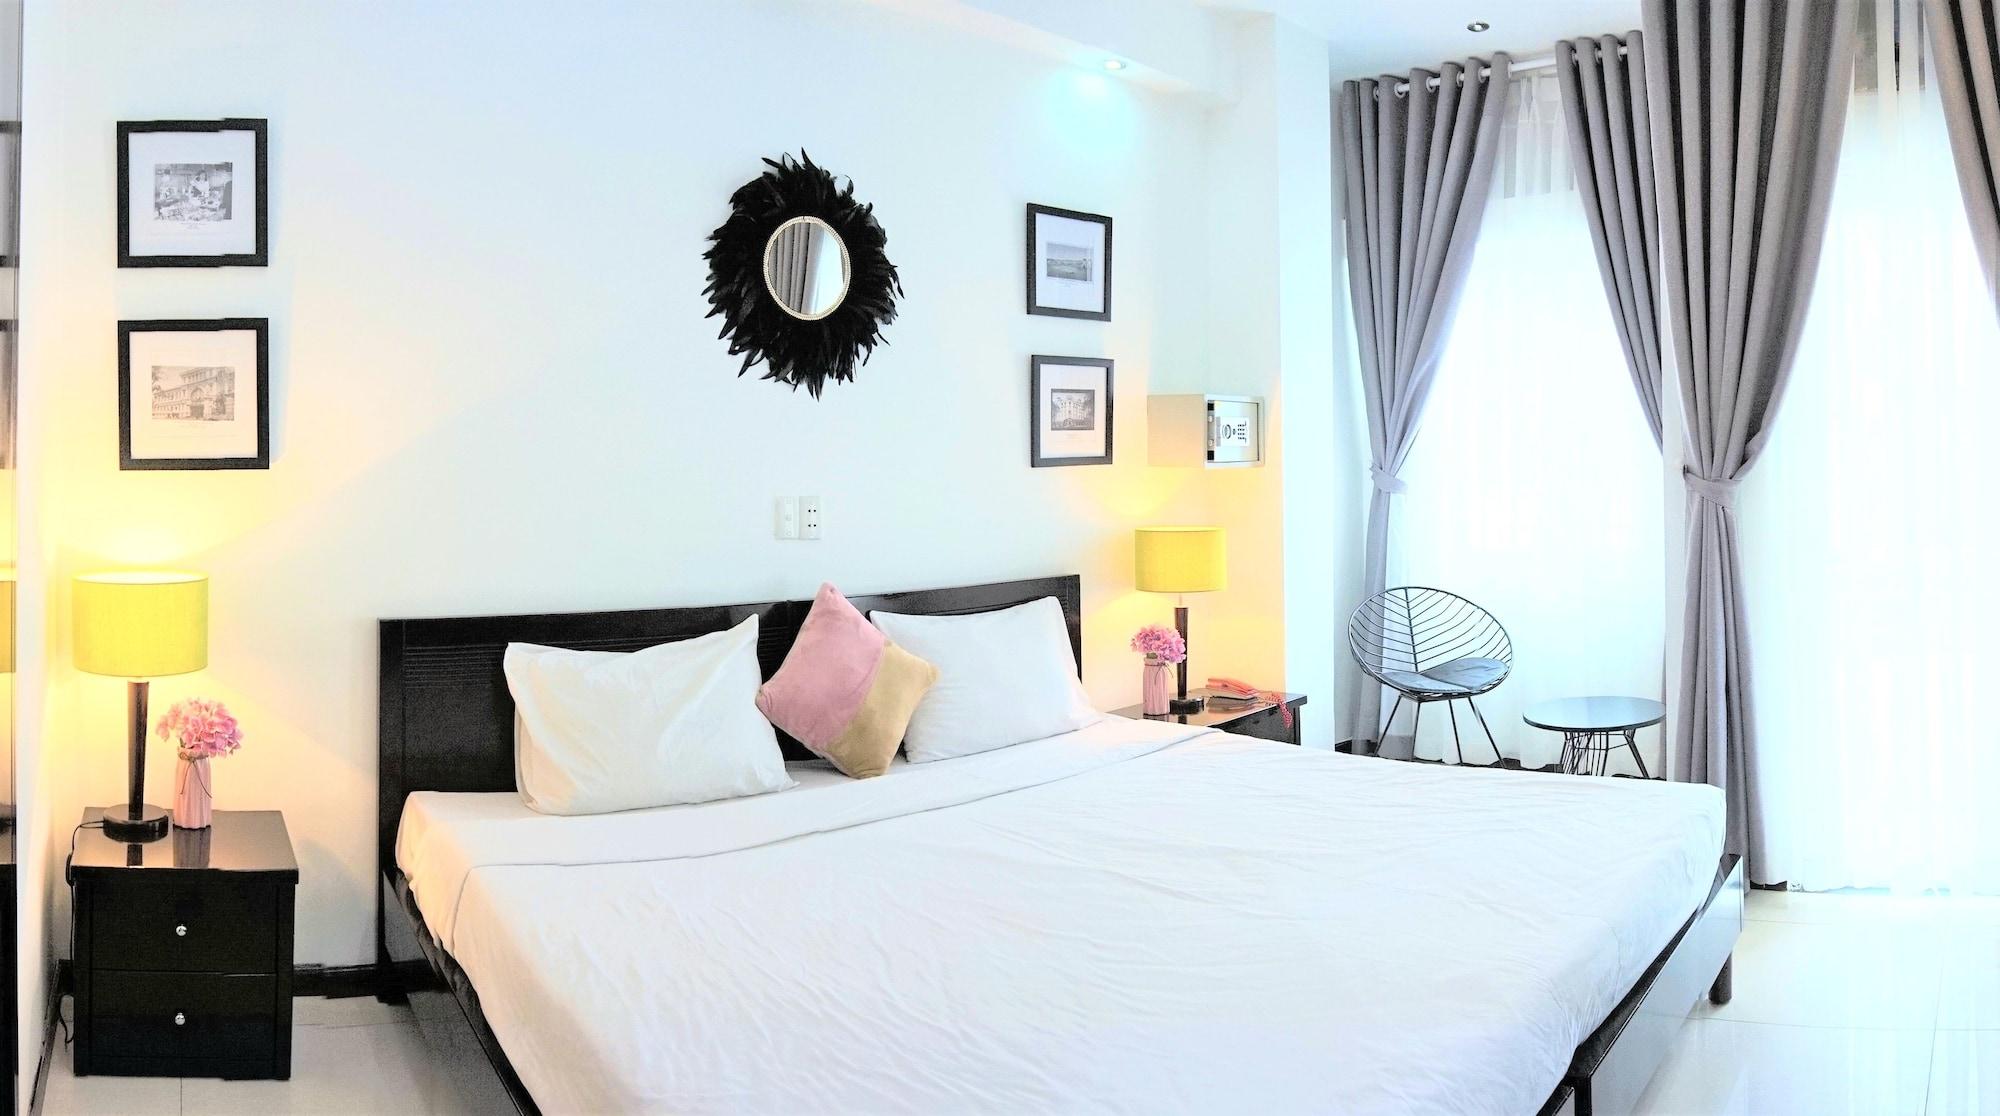 Green Suites Hotel, Quận 1